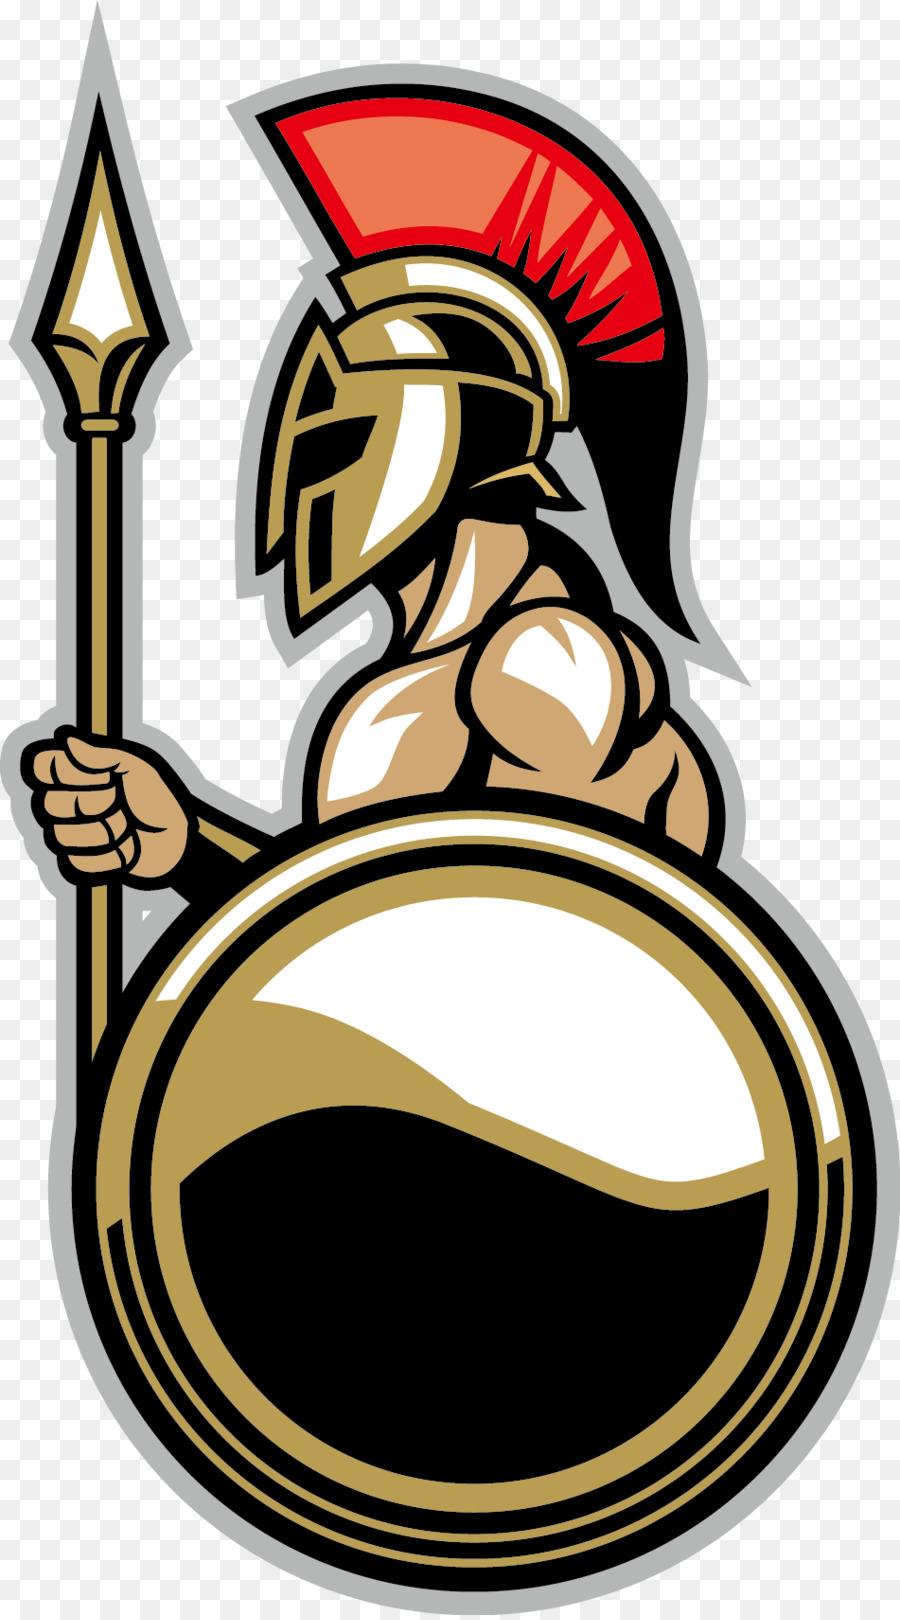 900x1620 Soldier Spartan Army Roman Army Royalty Free